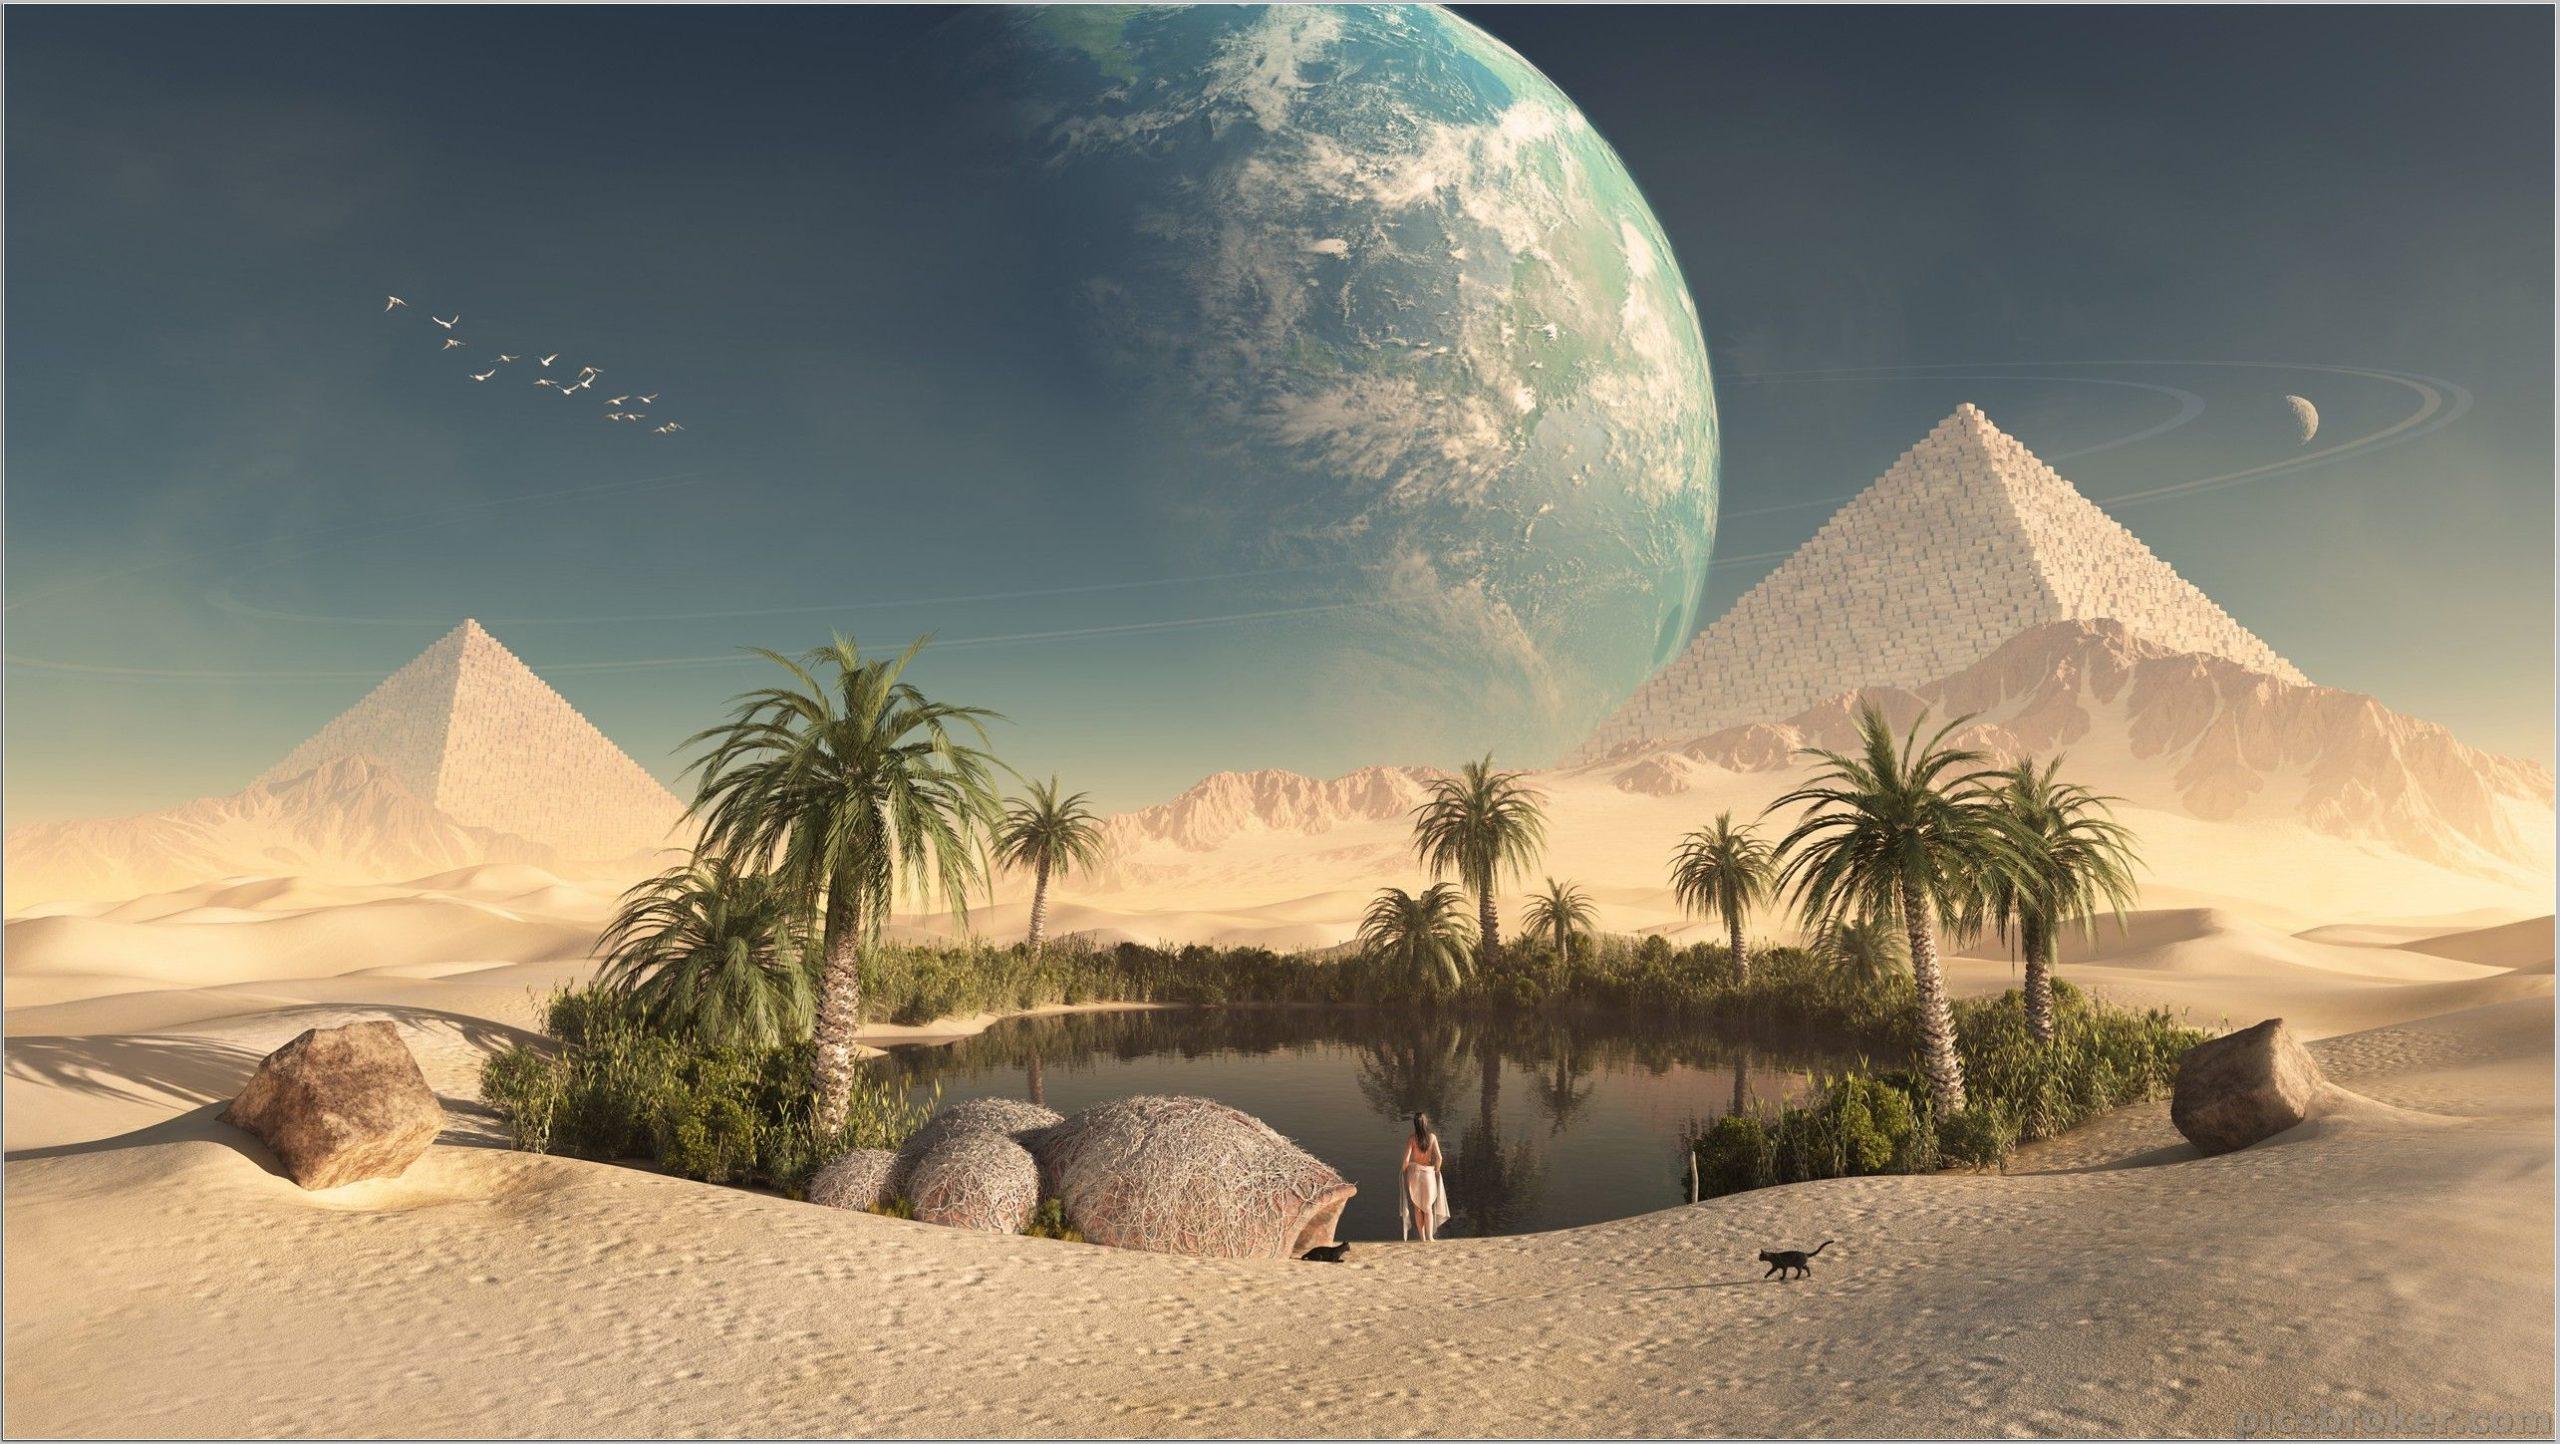 ancient egypt images